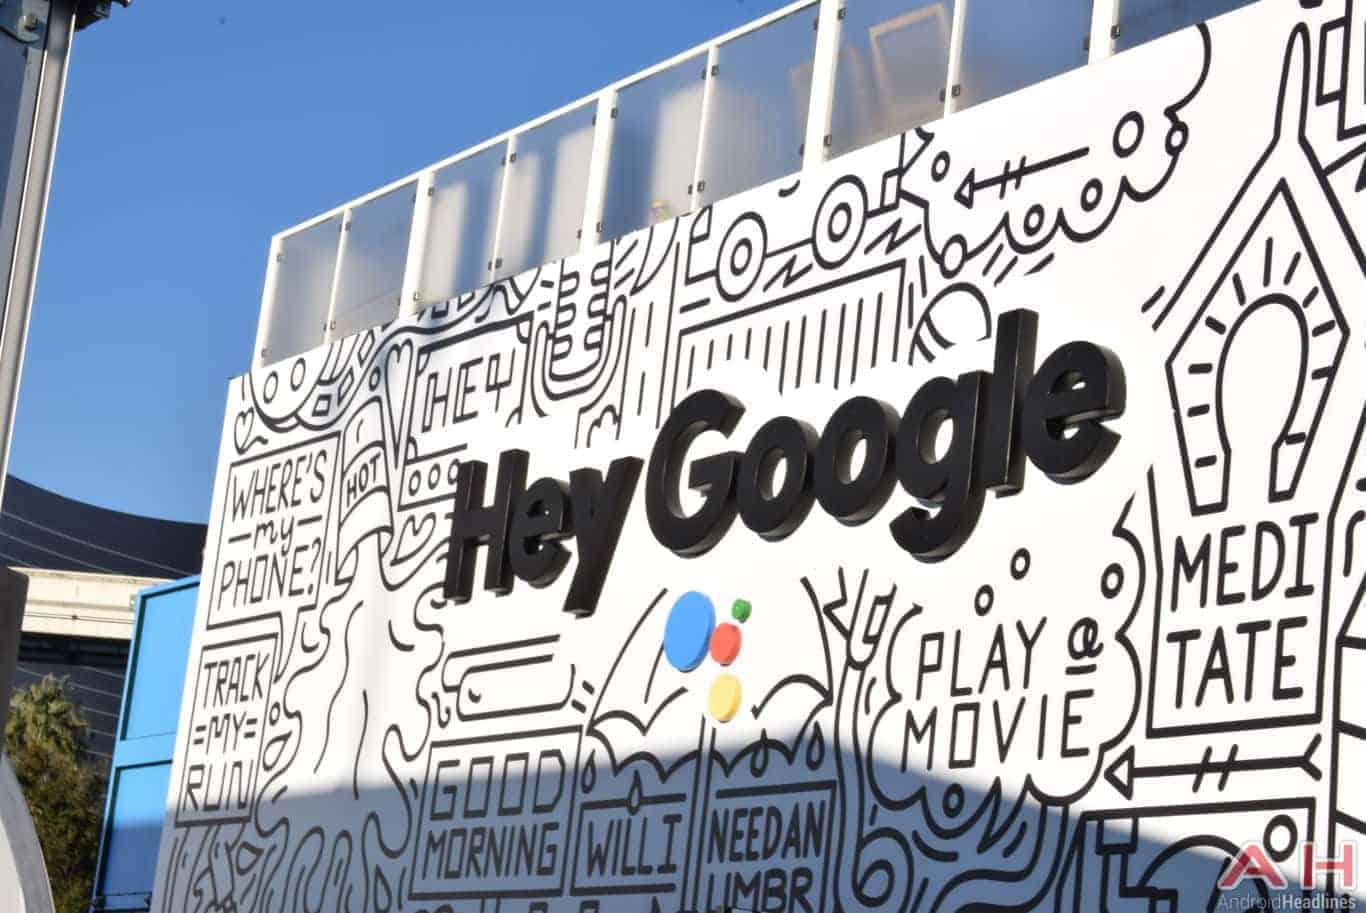 Google Assistant Hey Google CES 2018 AH 6